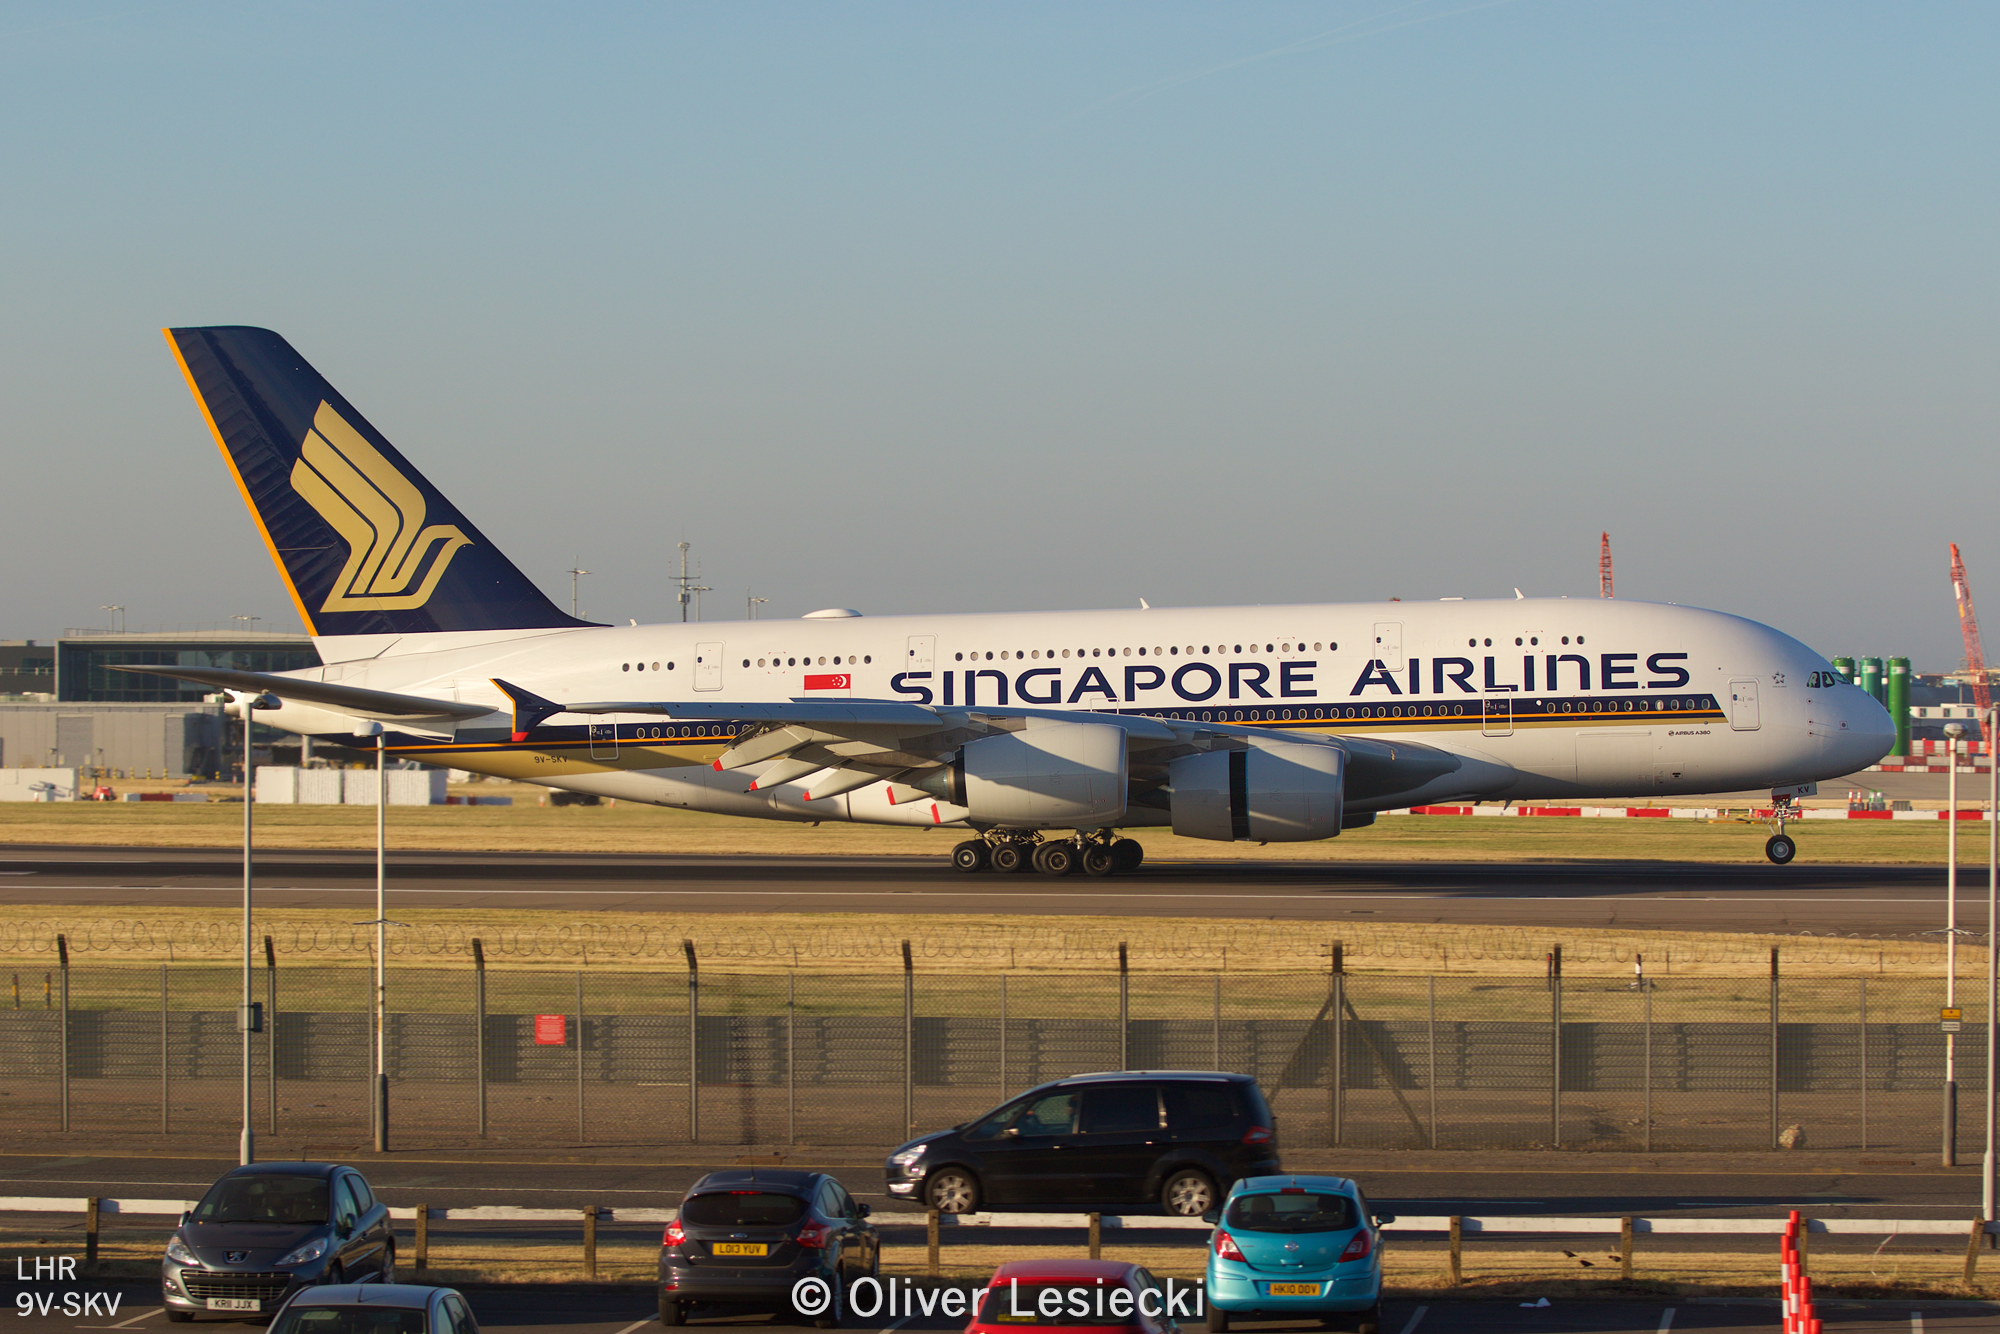 X_Singapore_A380_9VSKV_01_LHR_230618_IG7